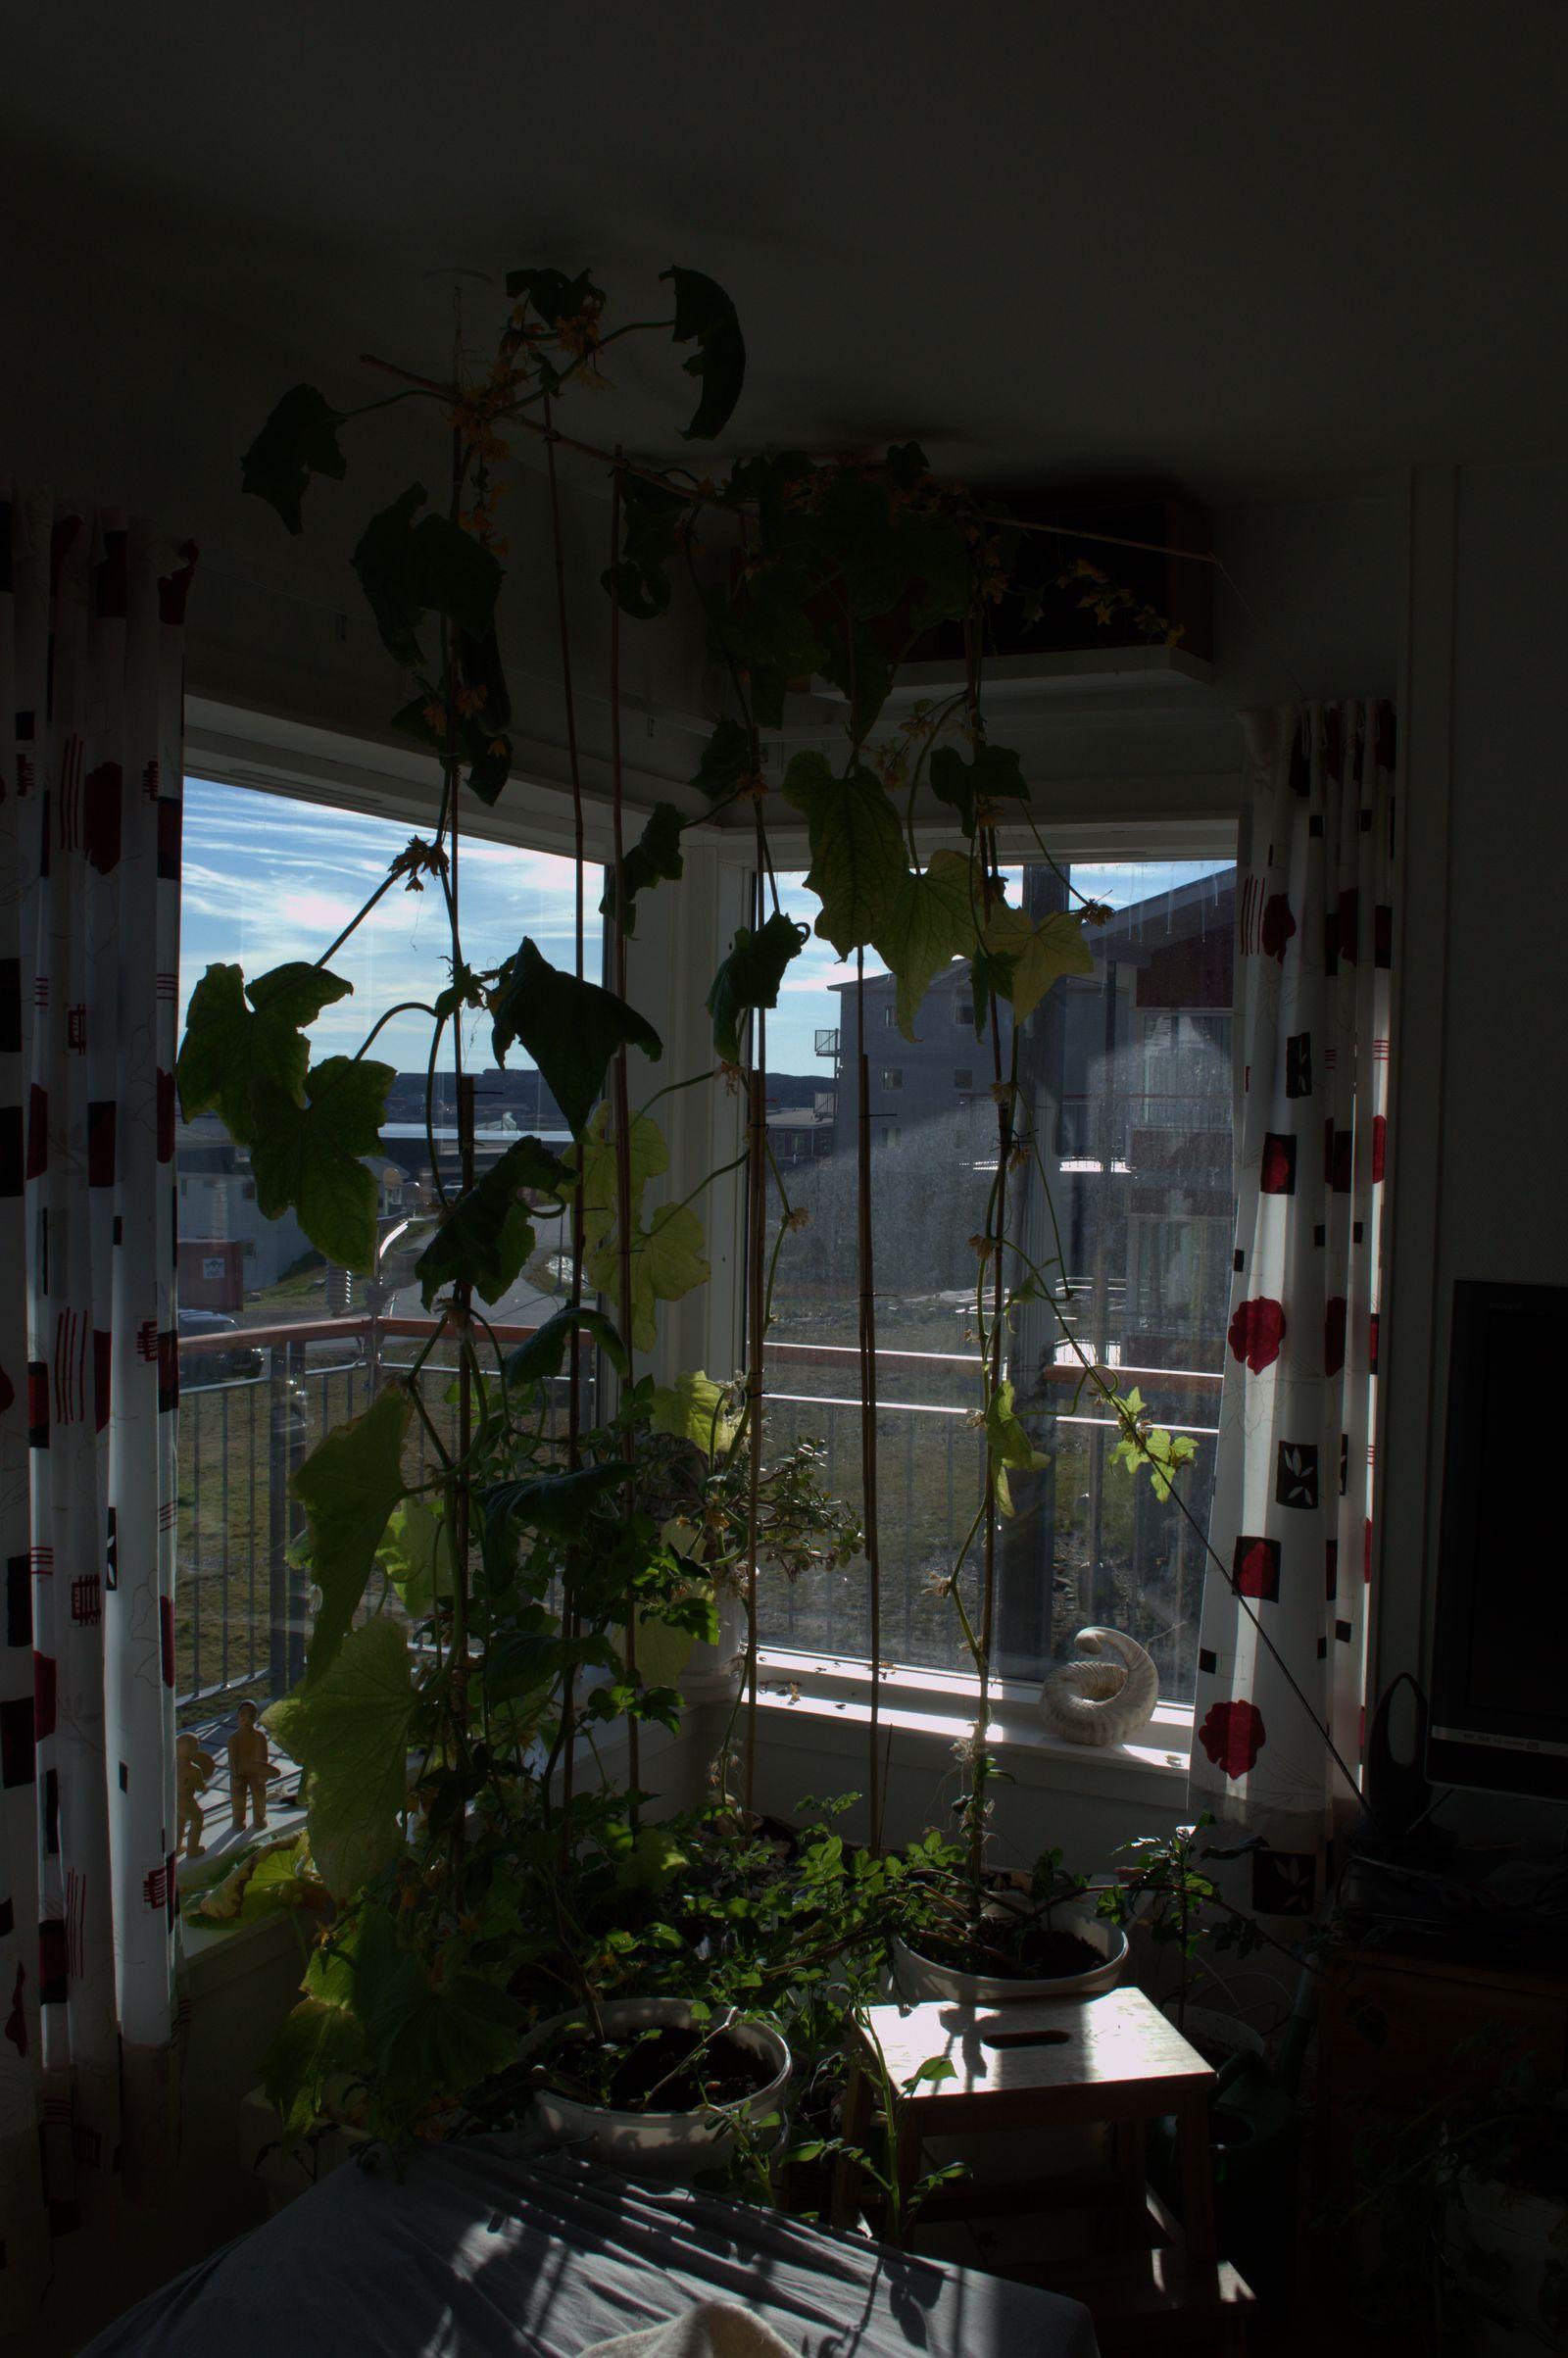 2014-07-06-1936_-_Agurkeplante_Kartofelspande